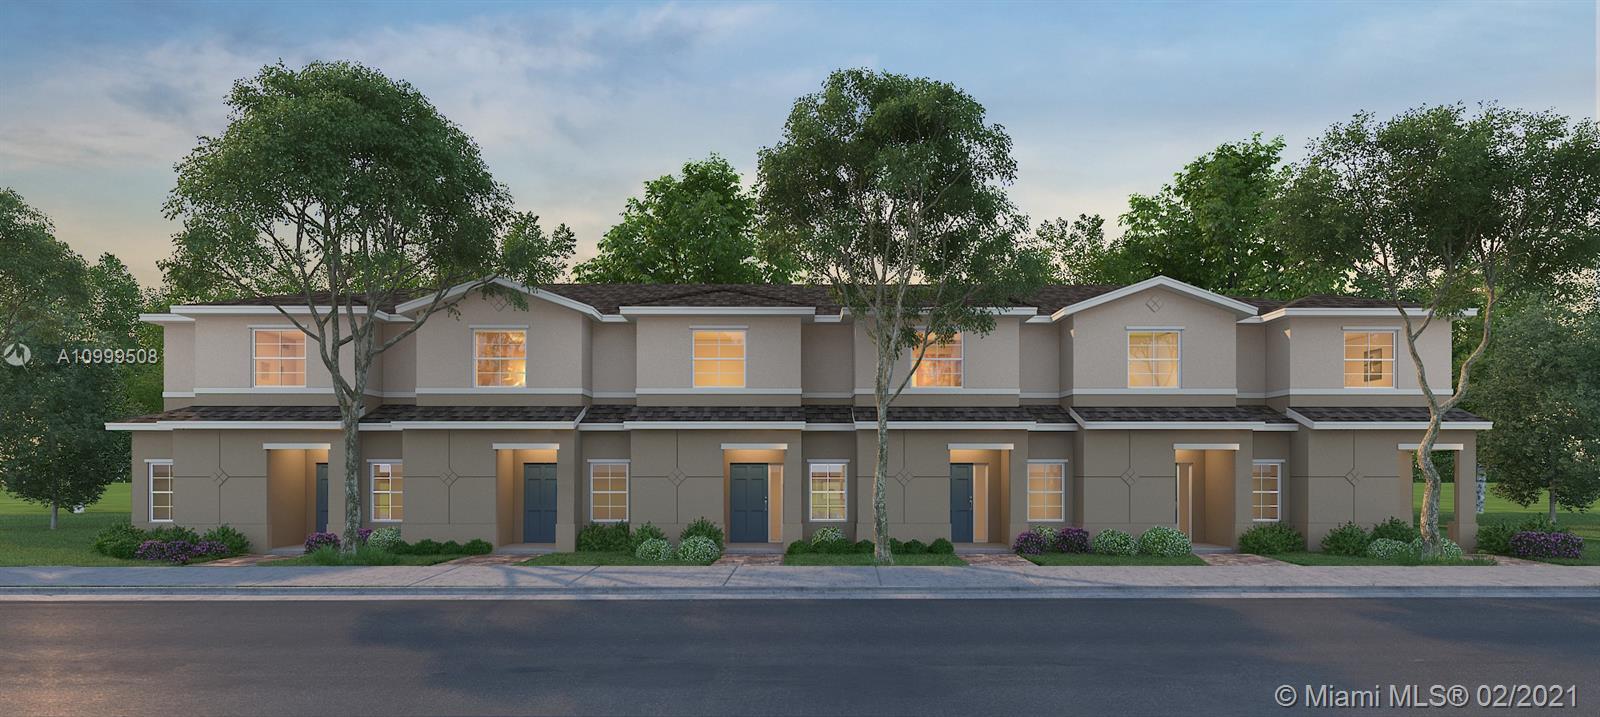 453 NE 5 LN Property Photo - Florida City, FL real estate listing